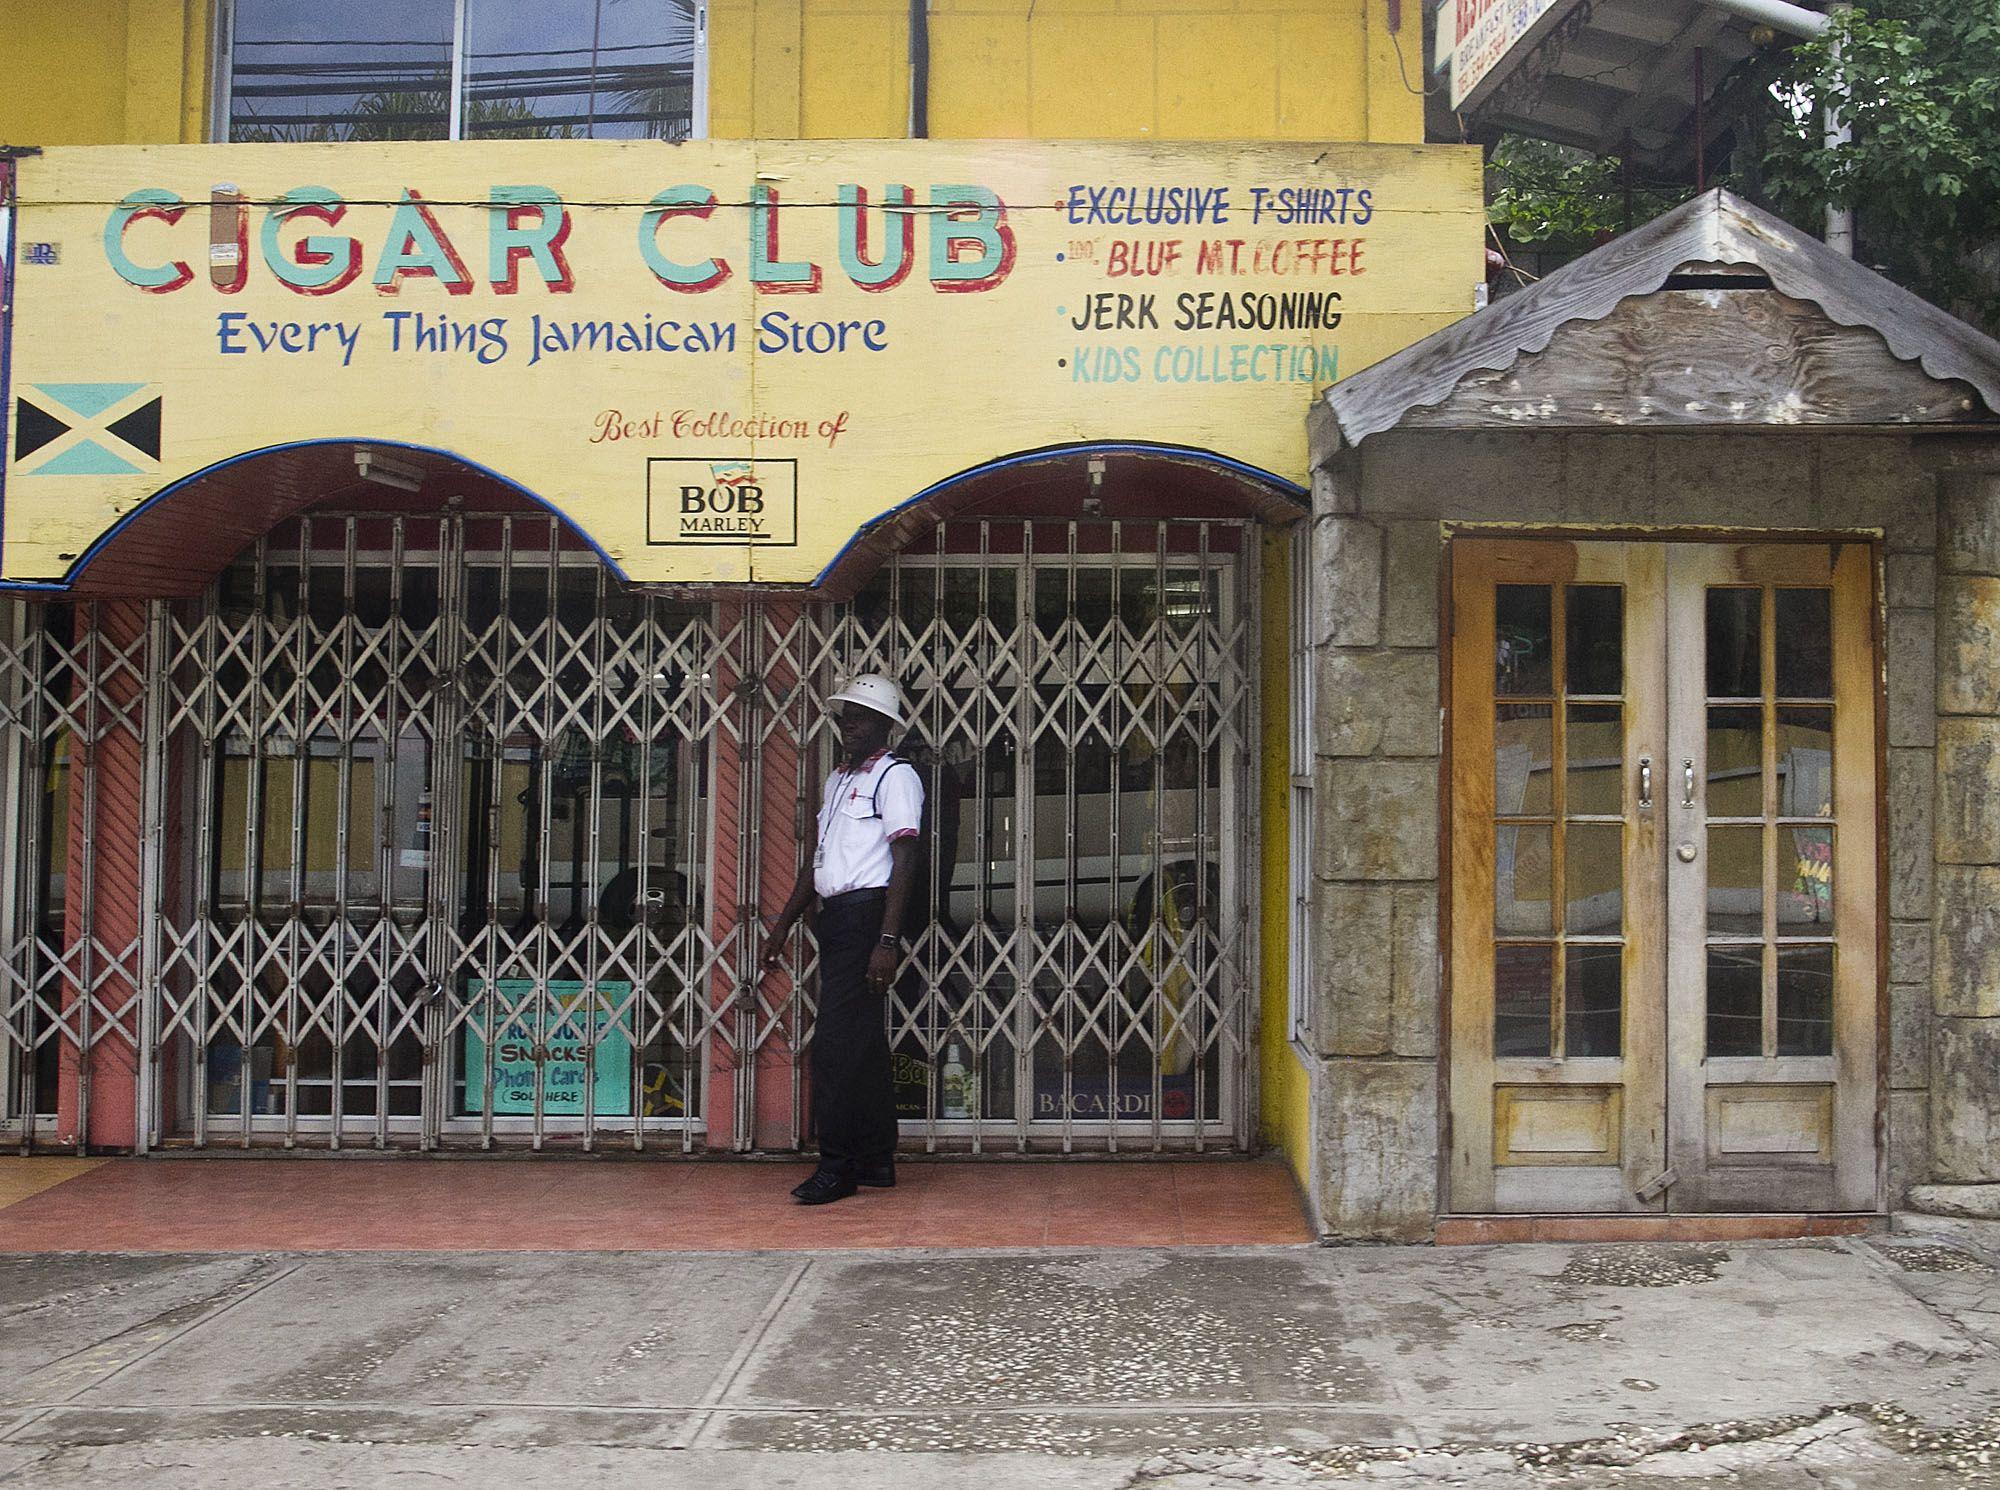 Kingston jamaica image by KiM CHUNG on R E C O R D S